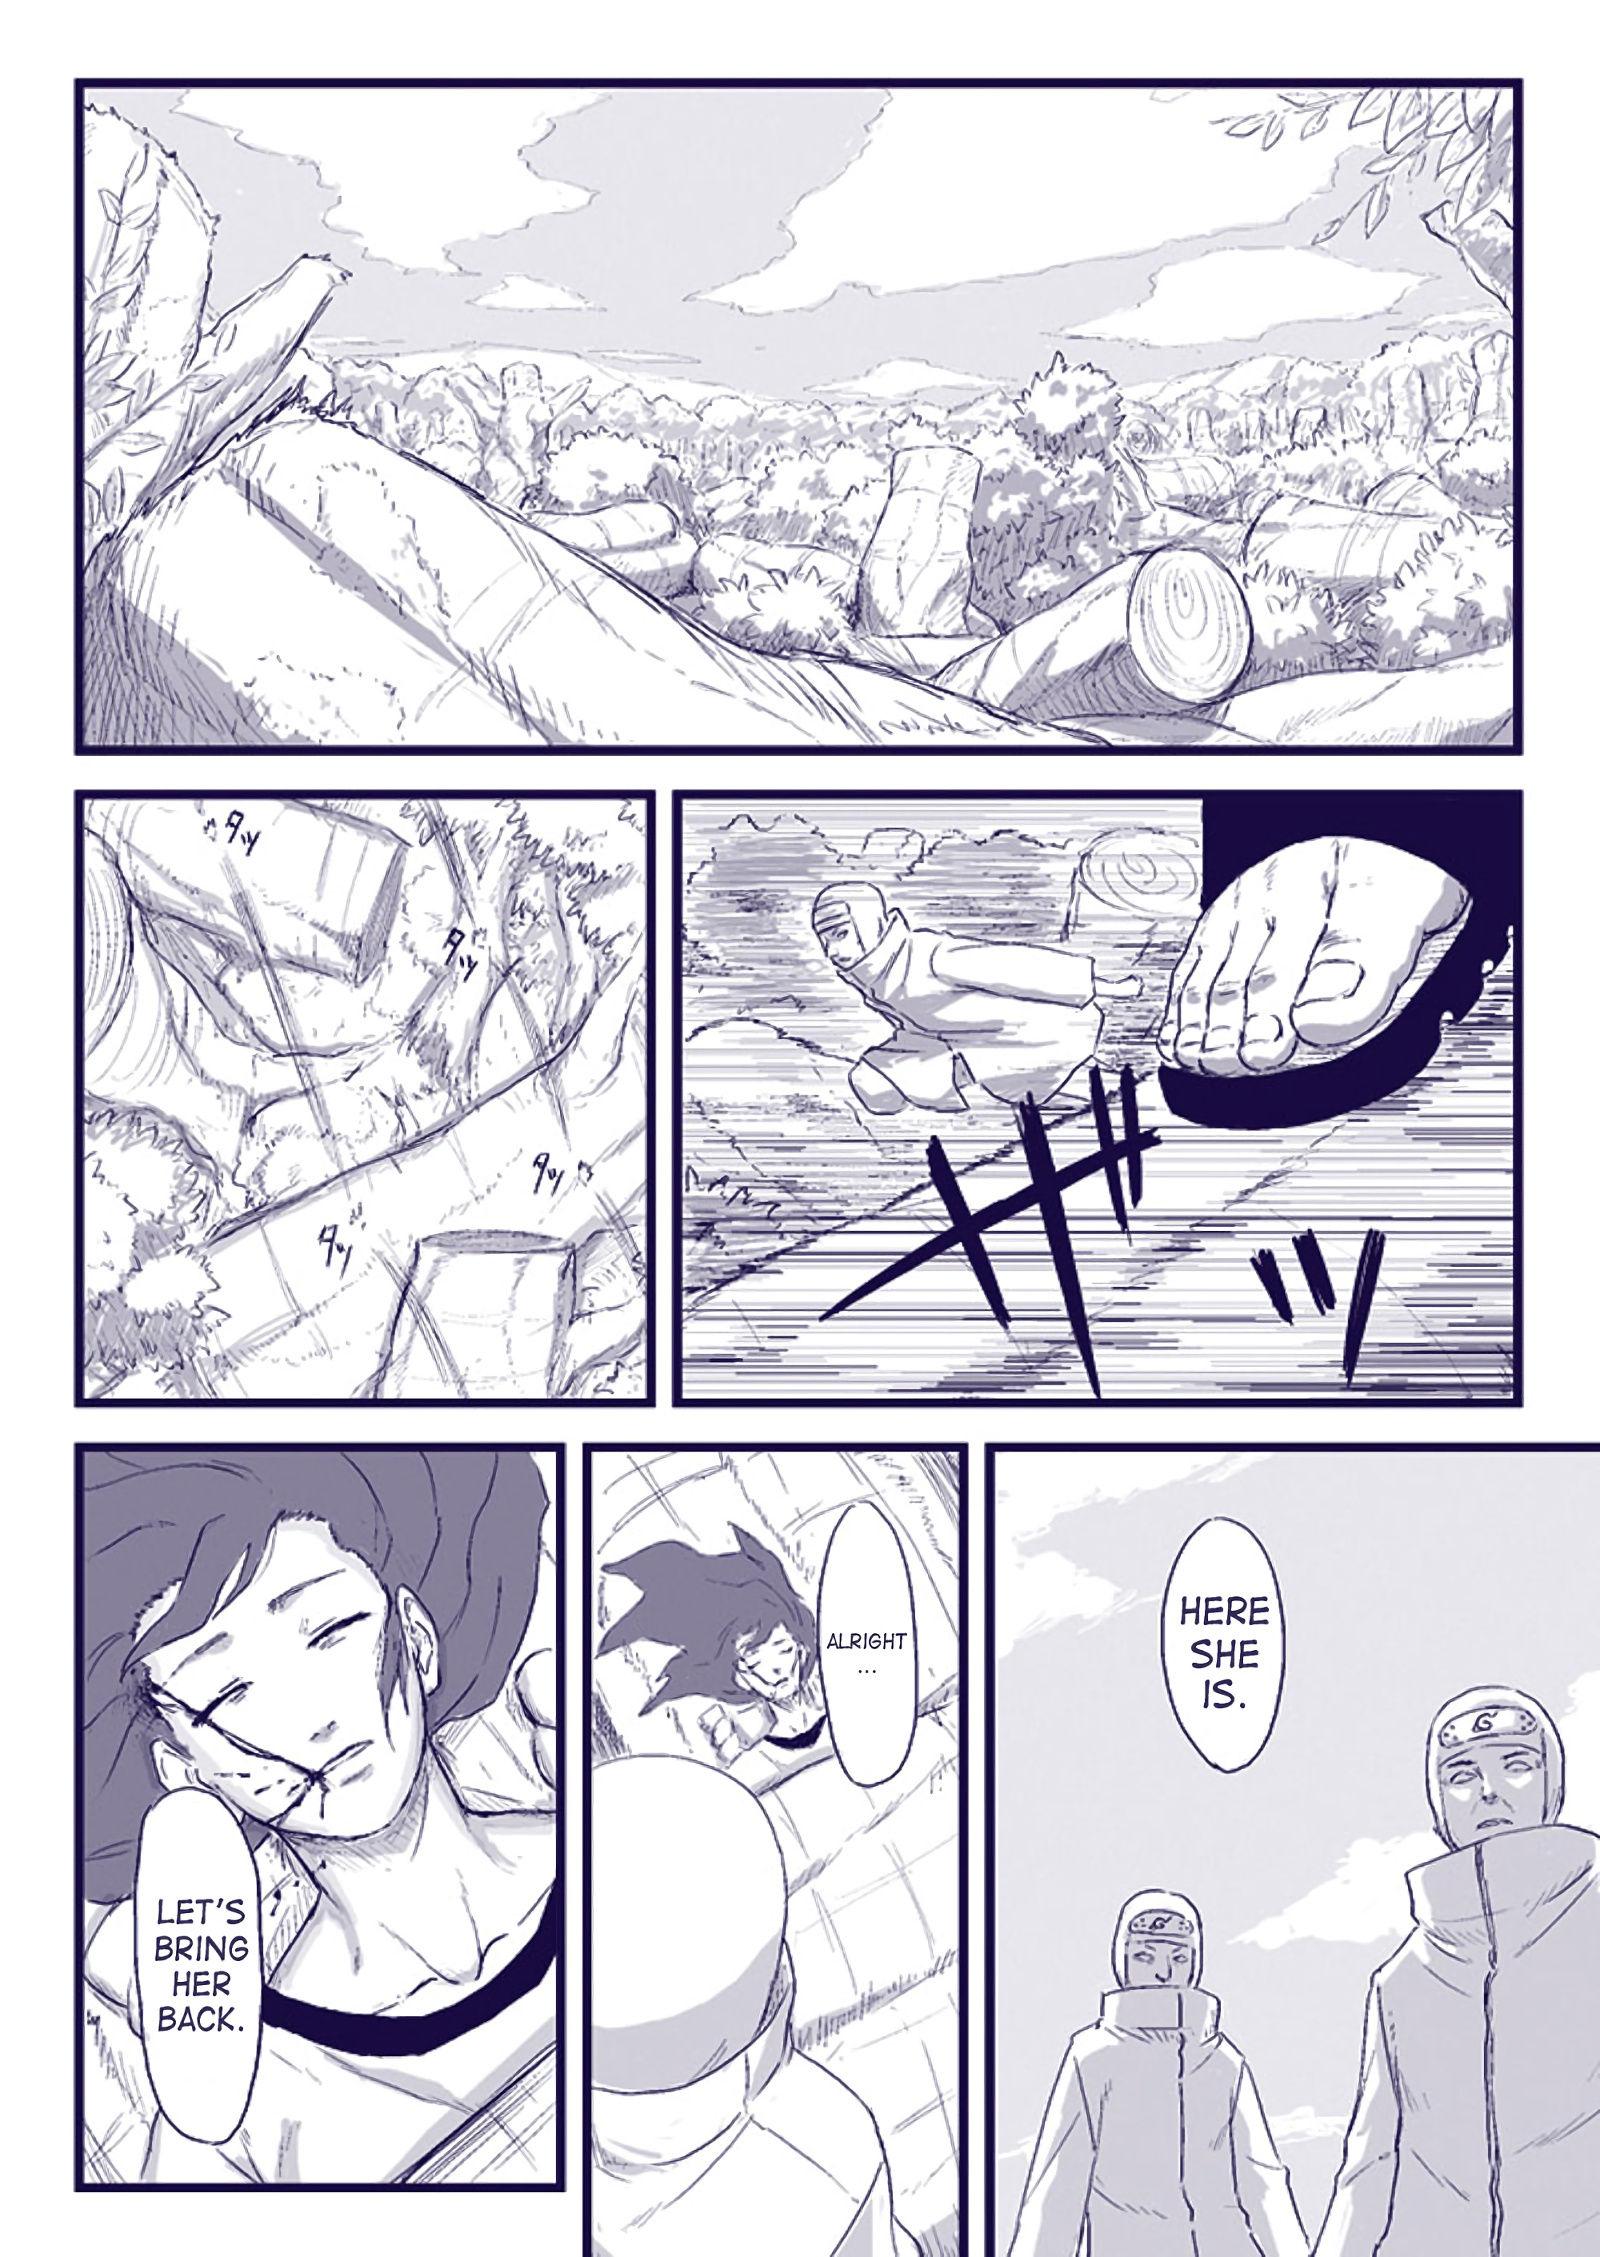 Ninja dependence vol. 2 hentai manga picture 3